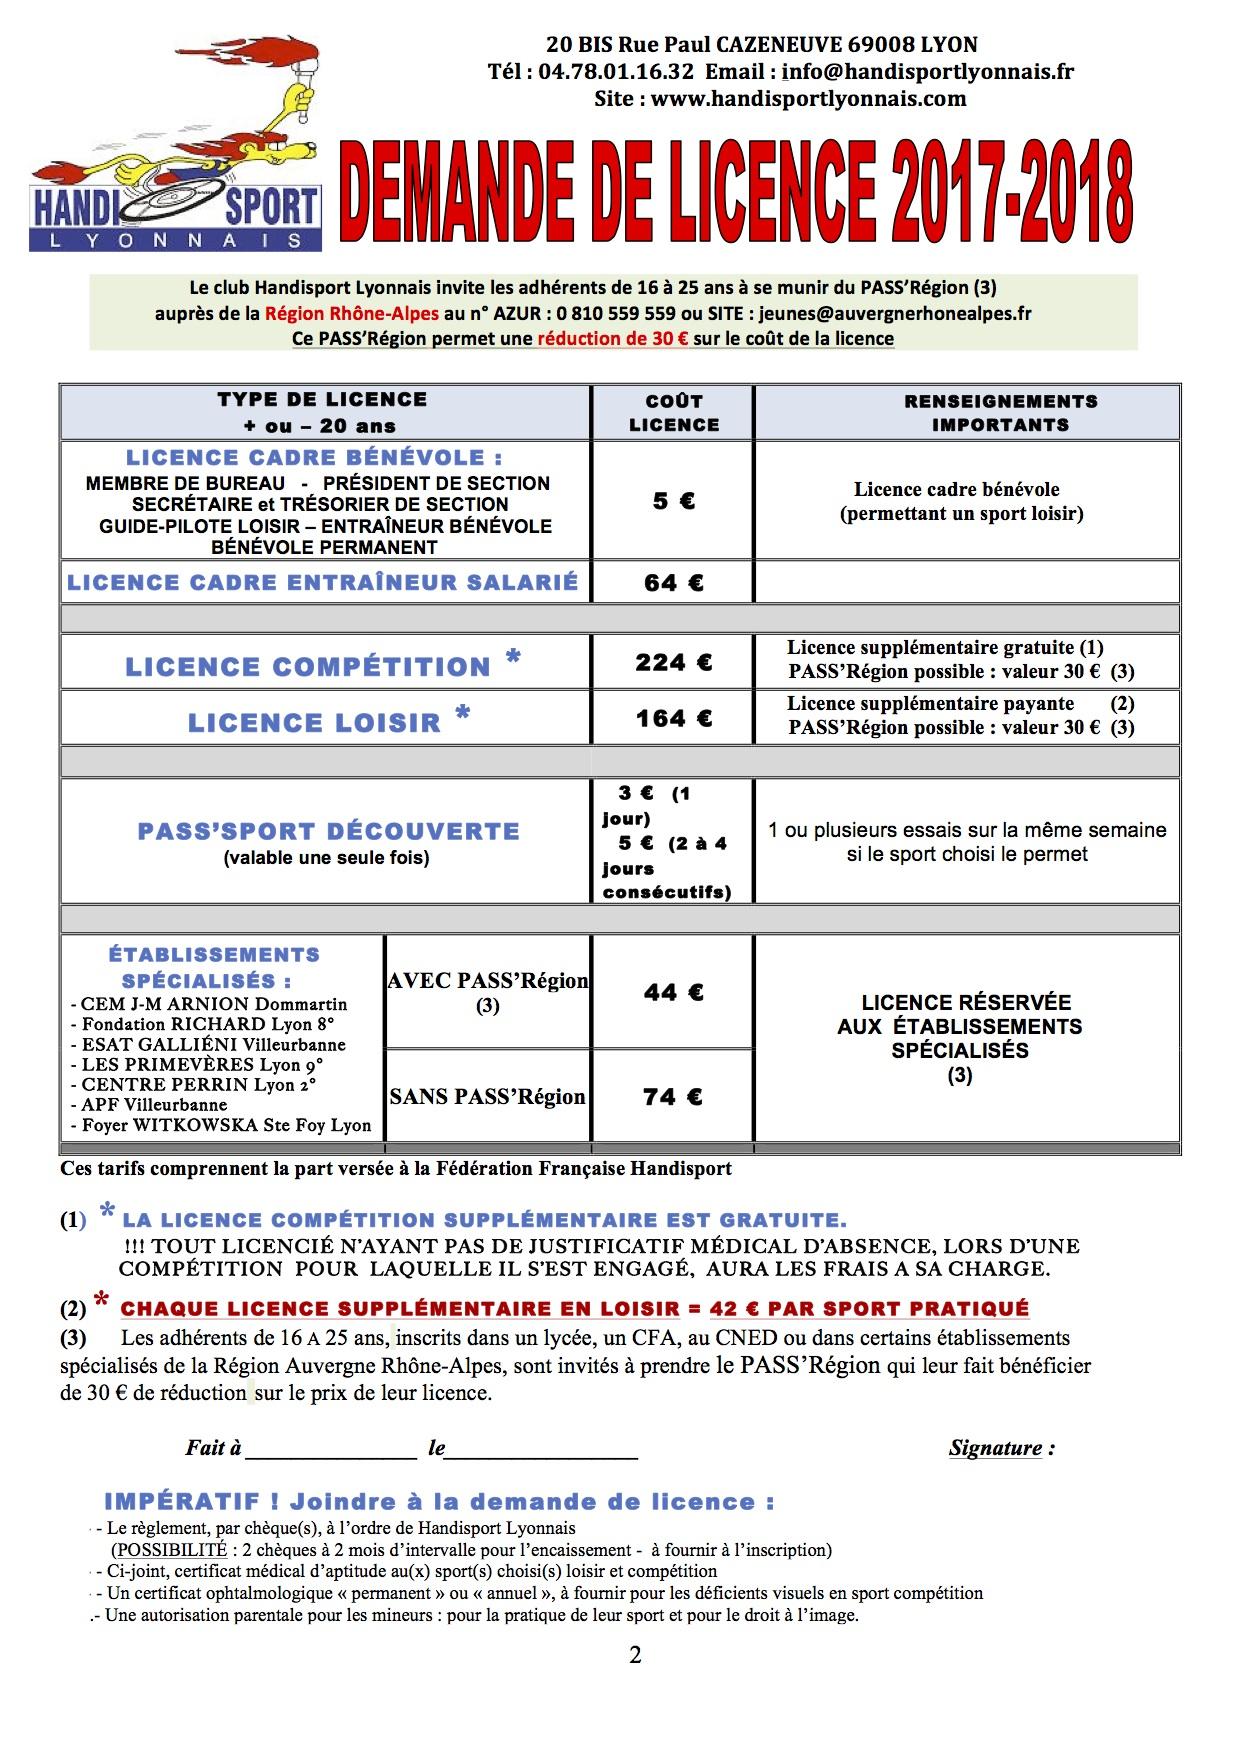 Licence Handisport Lyonnais